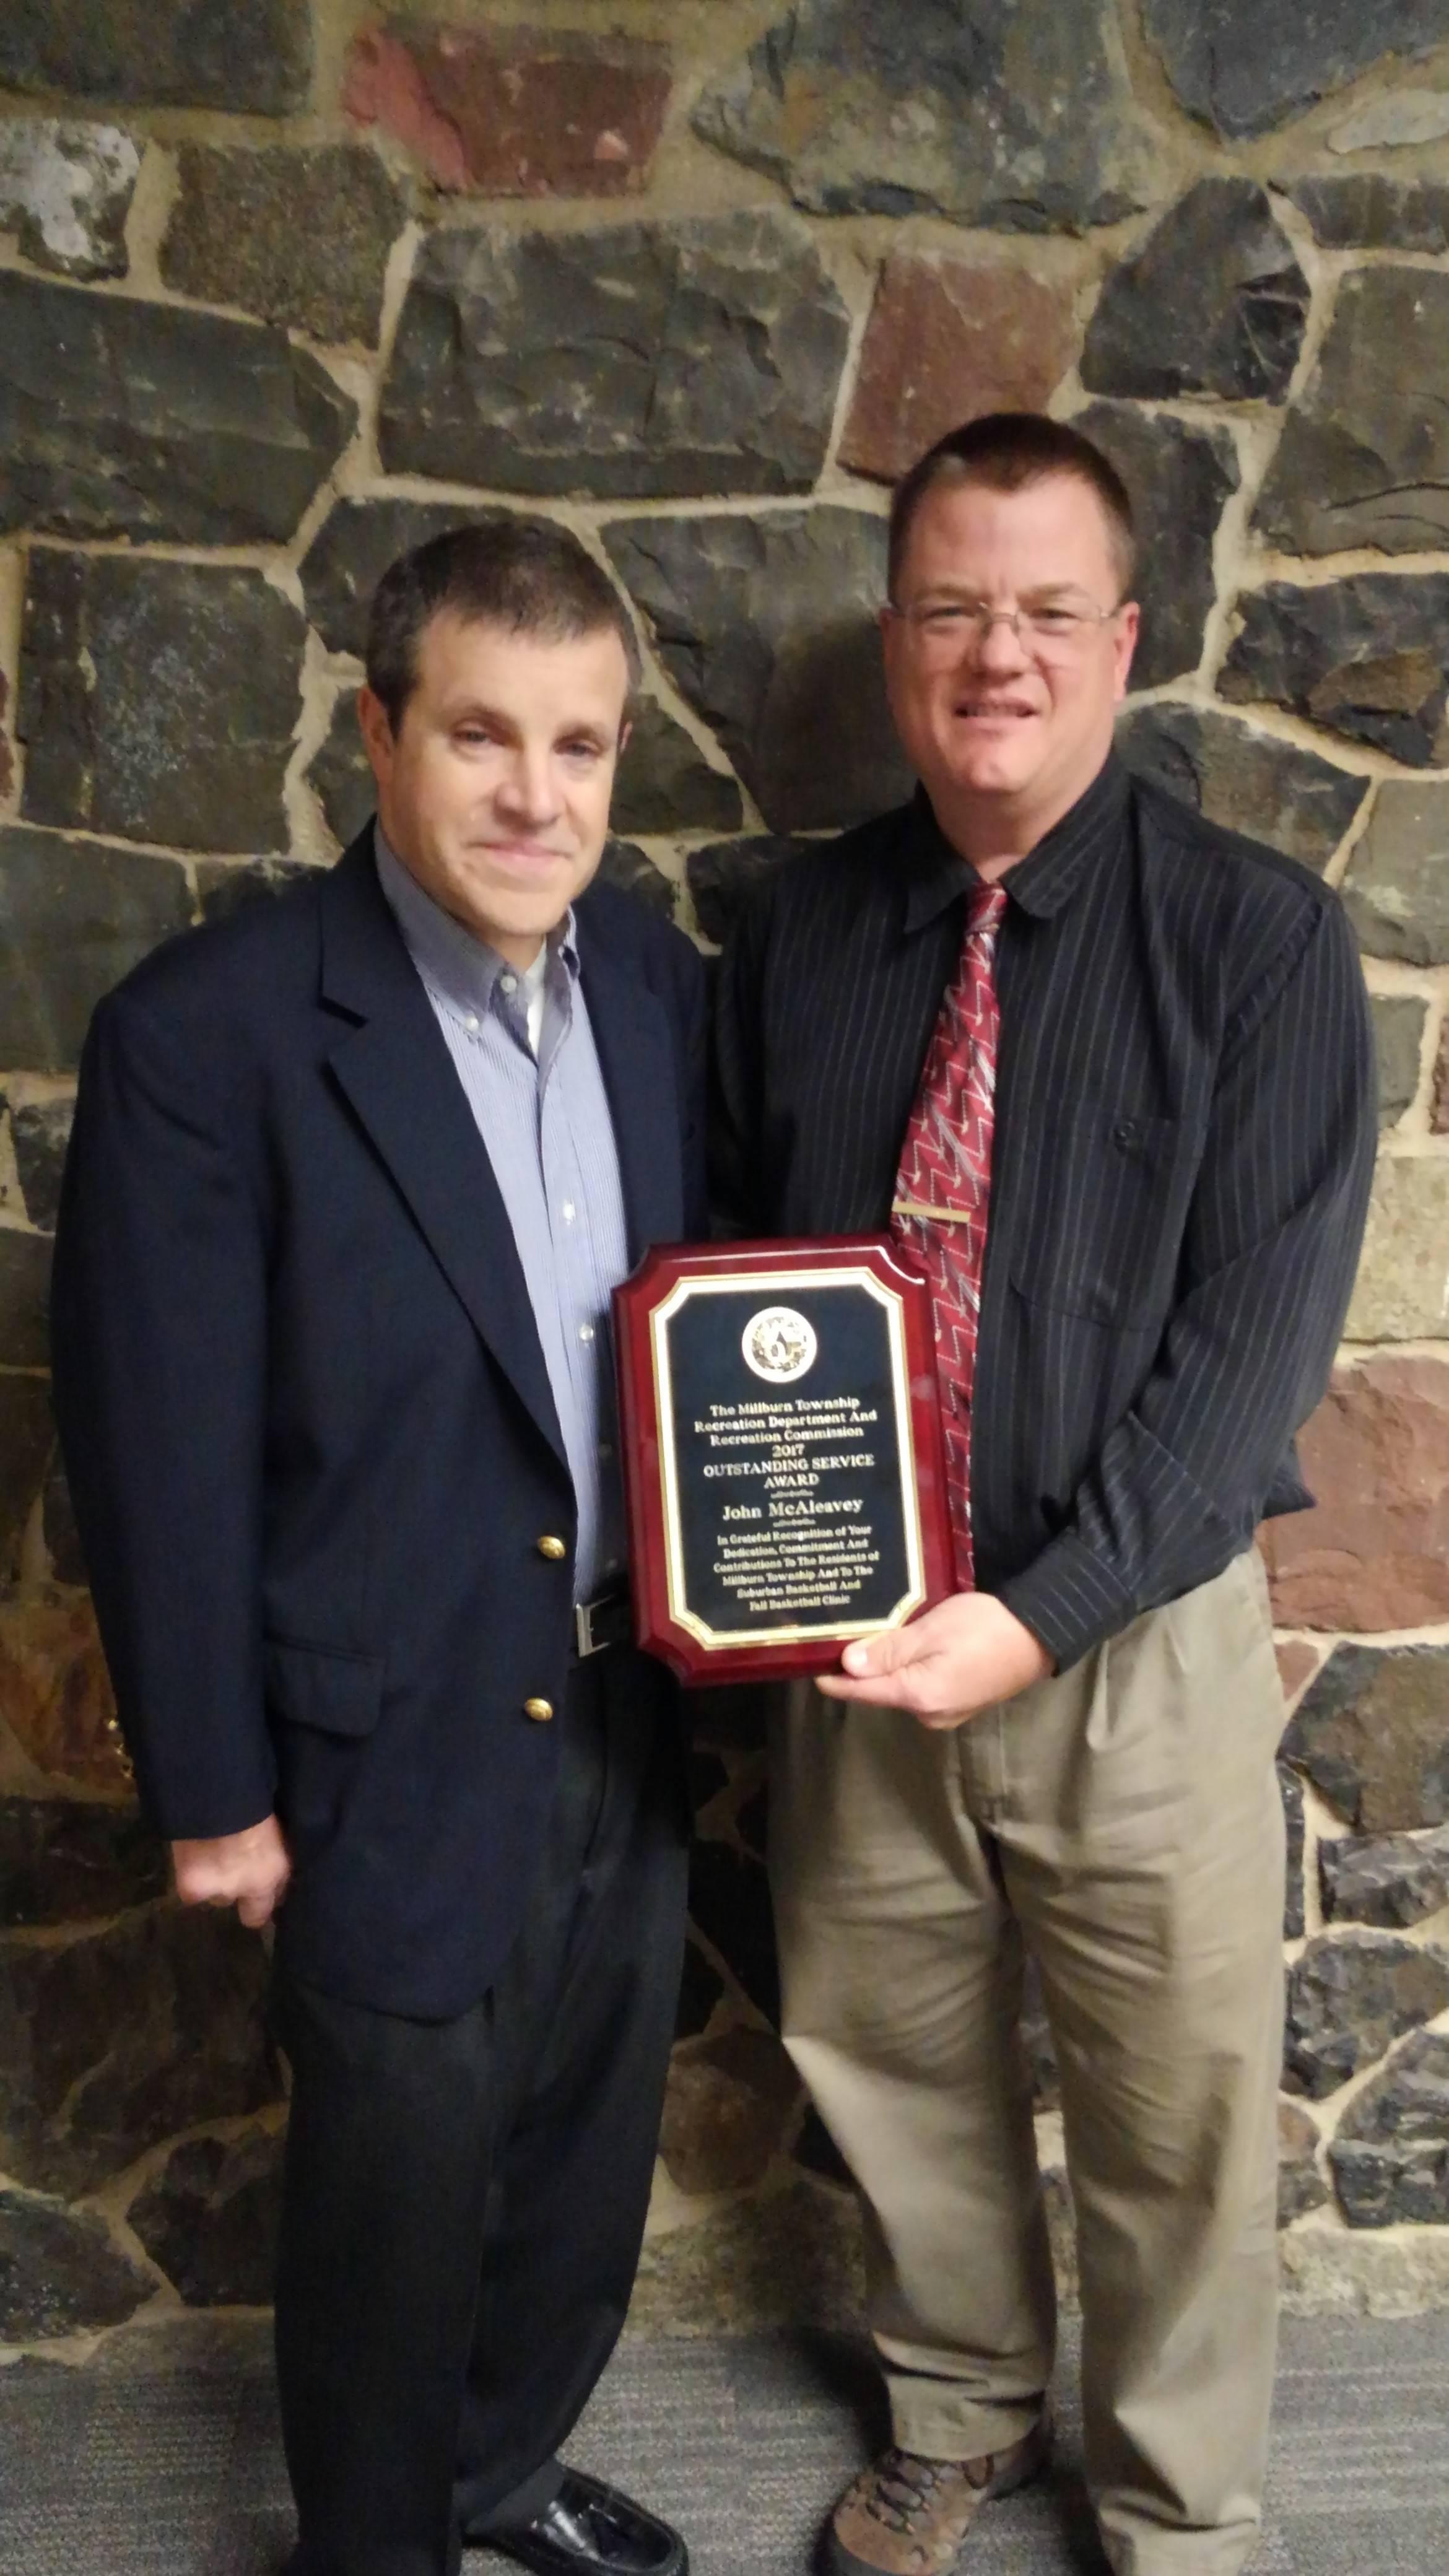 dcc0421a2c325b93af36_Outstanding_Service_Award_-_John_McAleavey_2017.jpg